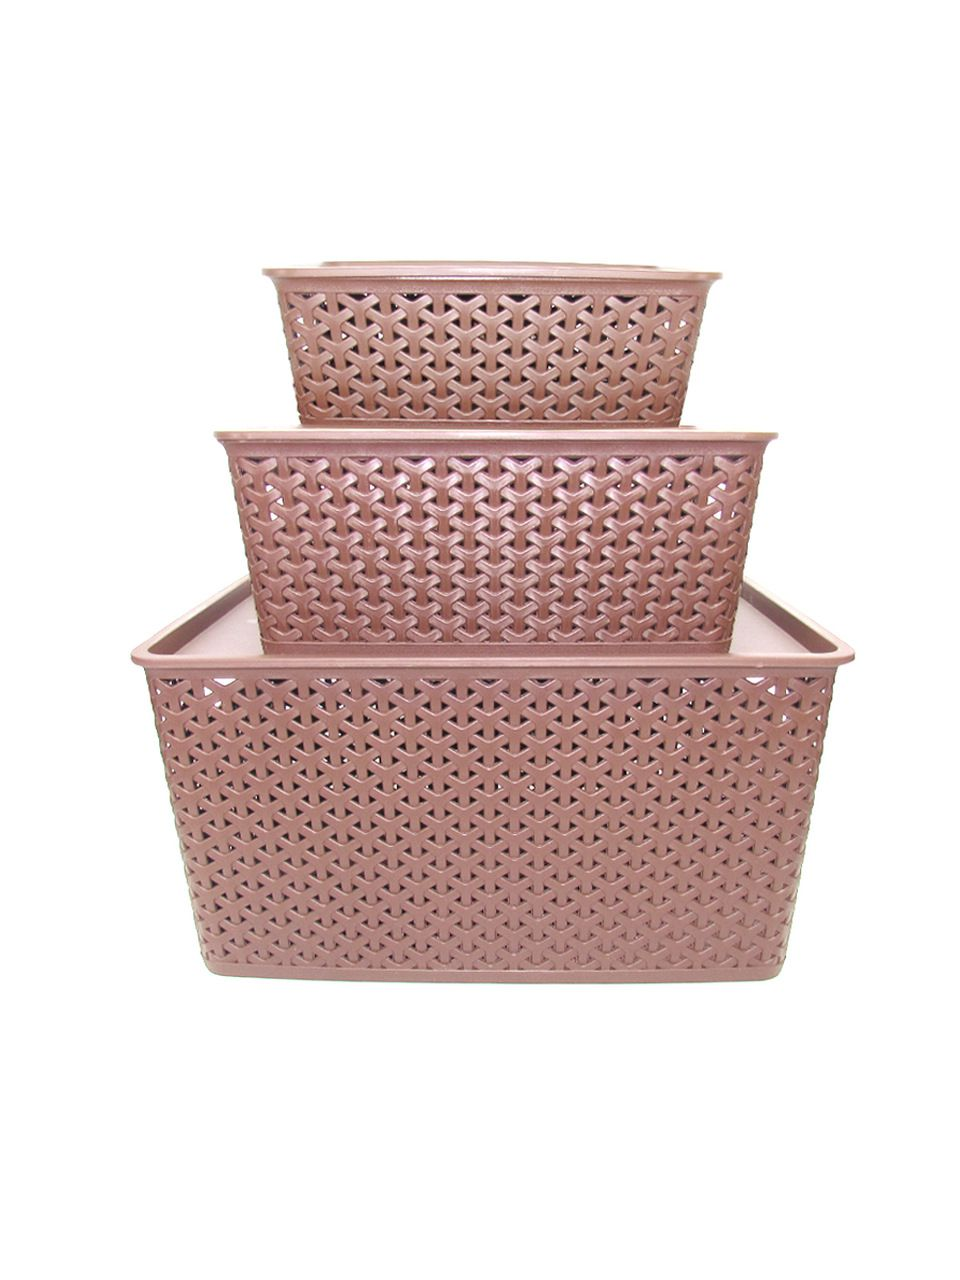 Conjunto Caixa Organizadora Rattan 3 Tamanhos